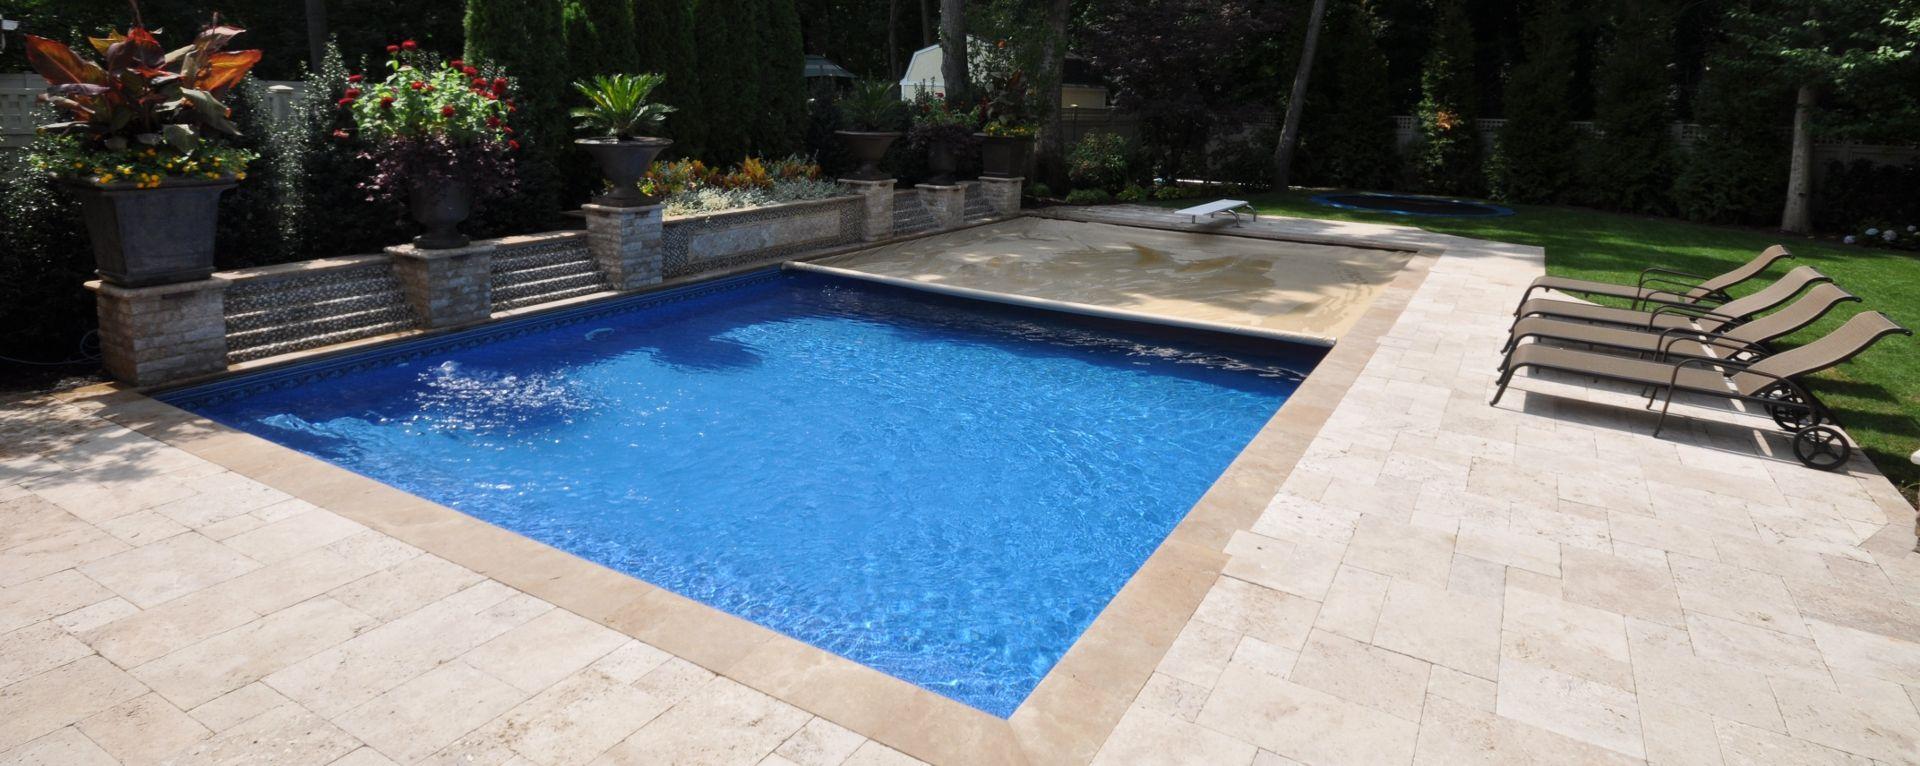 Home Natural Stone Pavers Paver Tiles Pool Patio